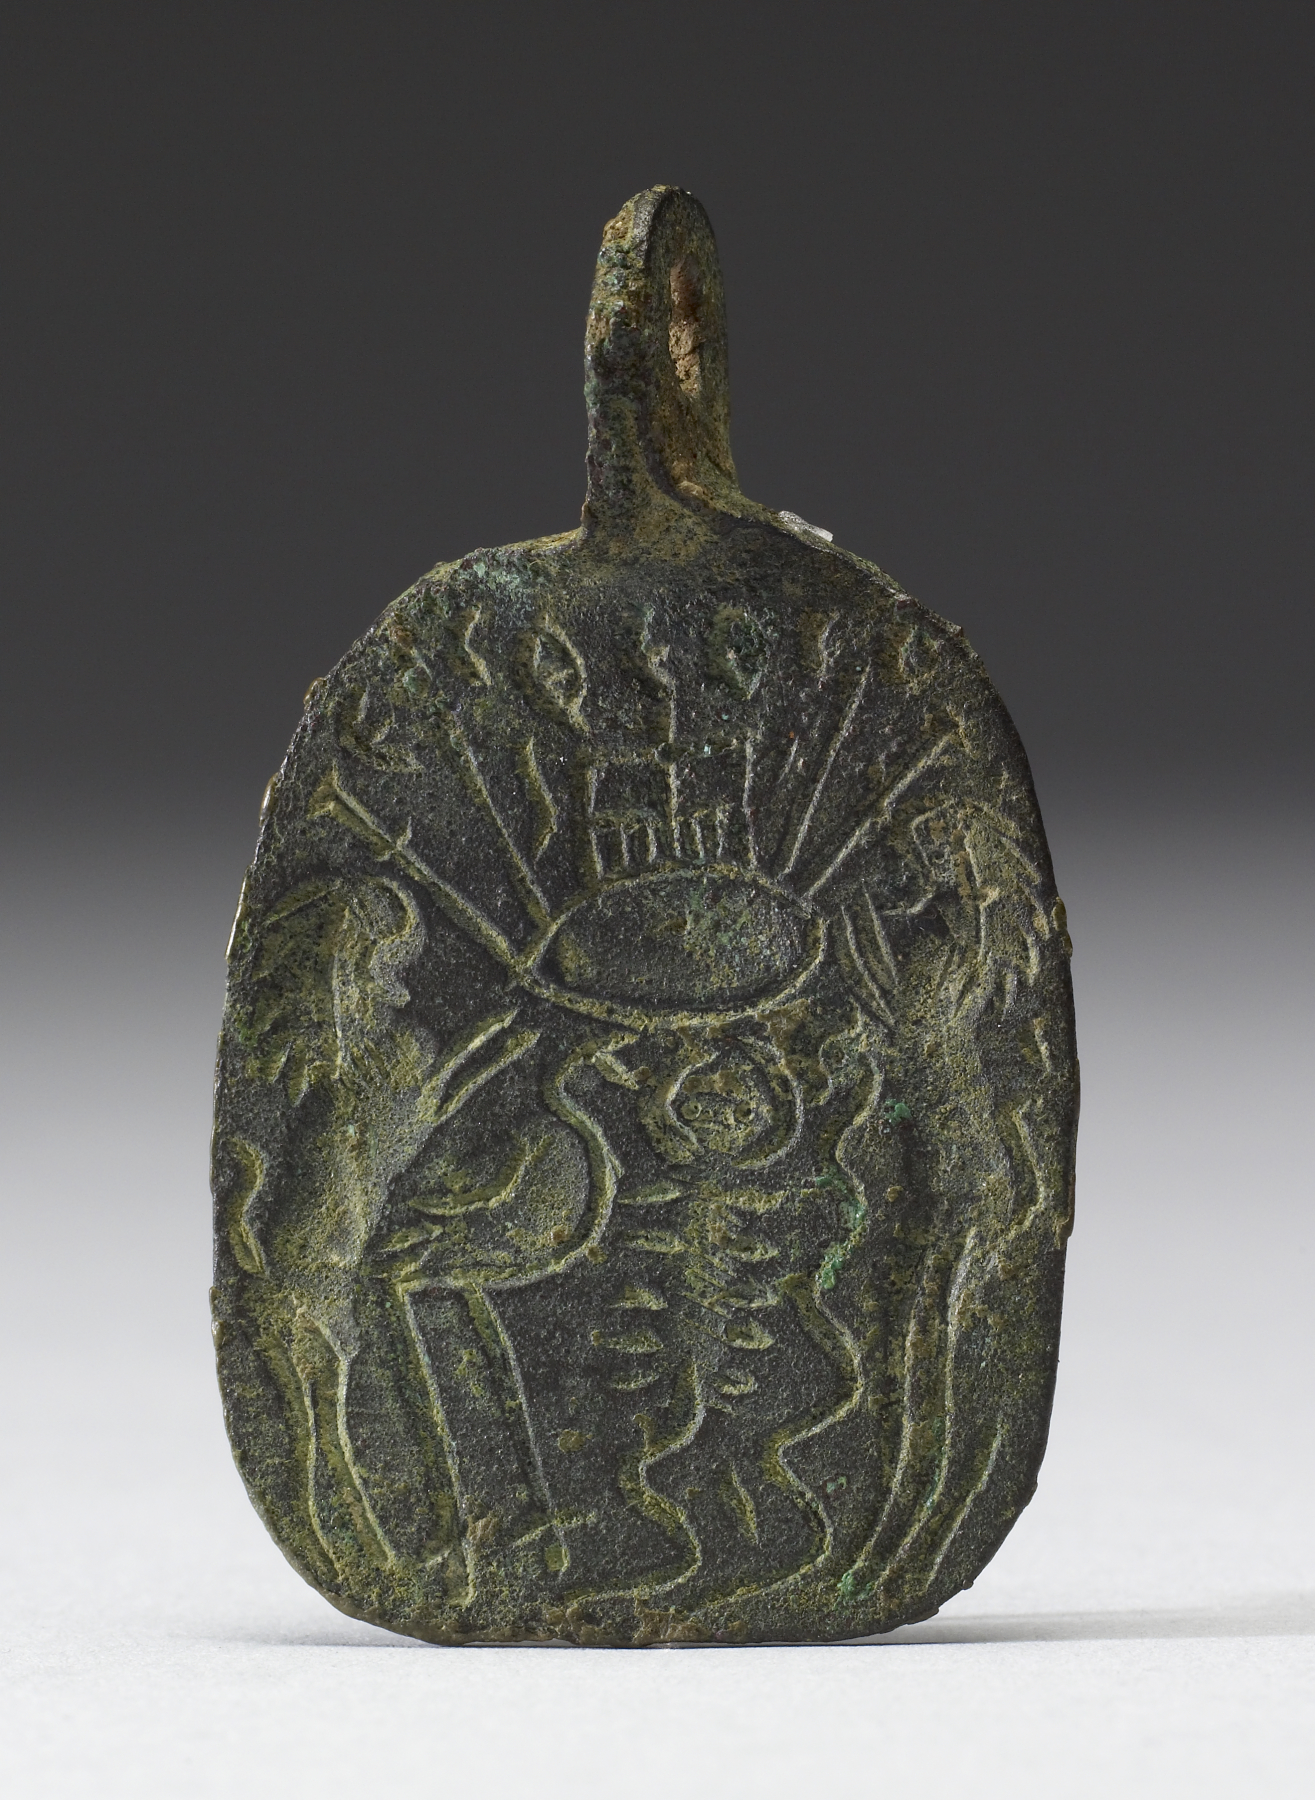 Byzantine_-_Amuletic_Pendant_-_Walters_542653.jpg